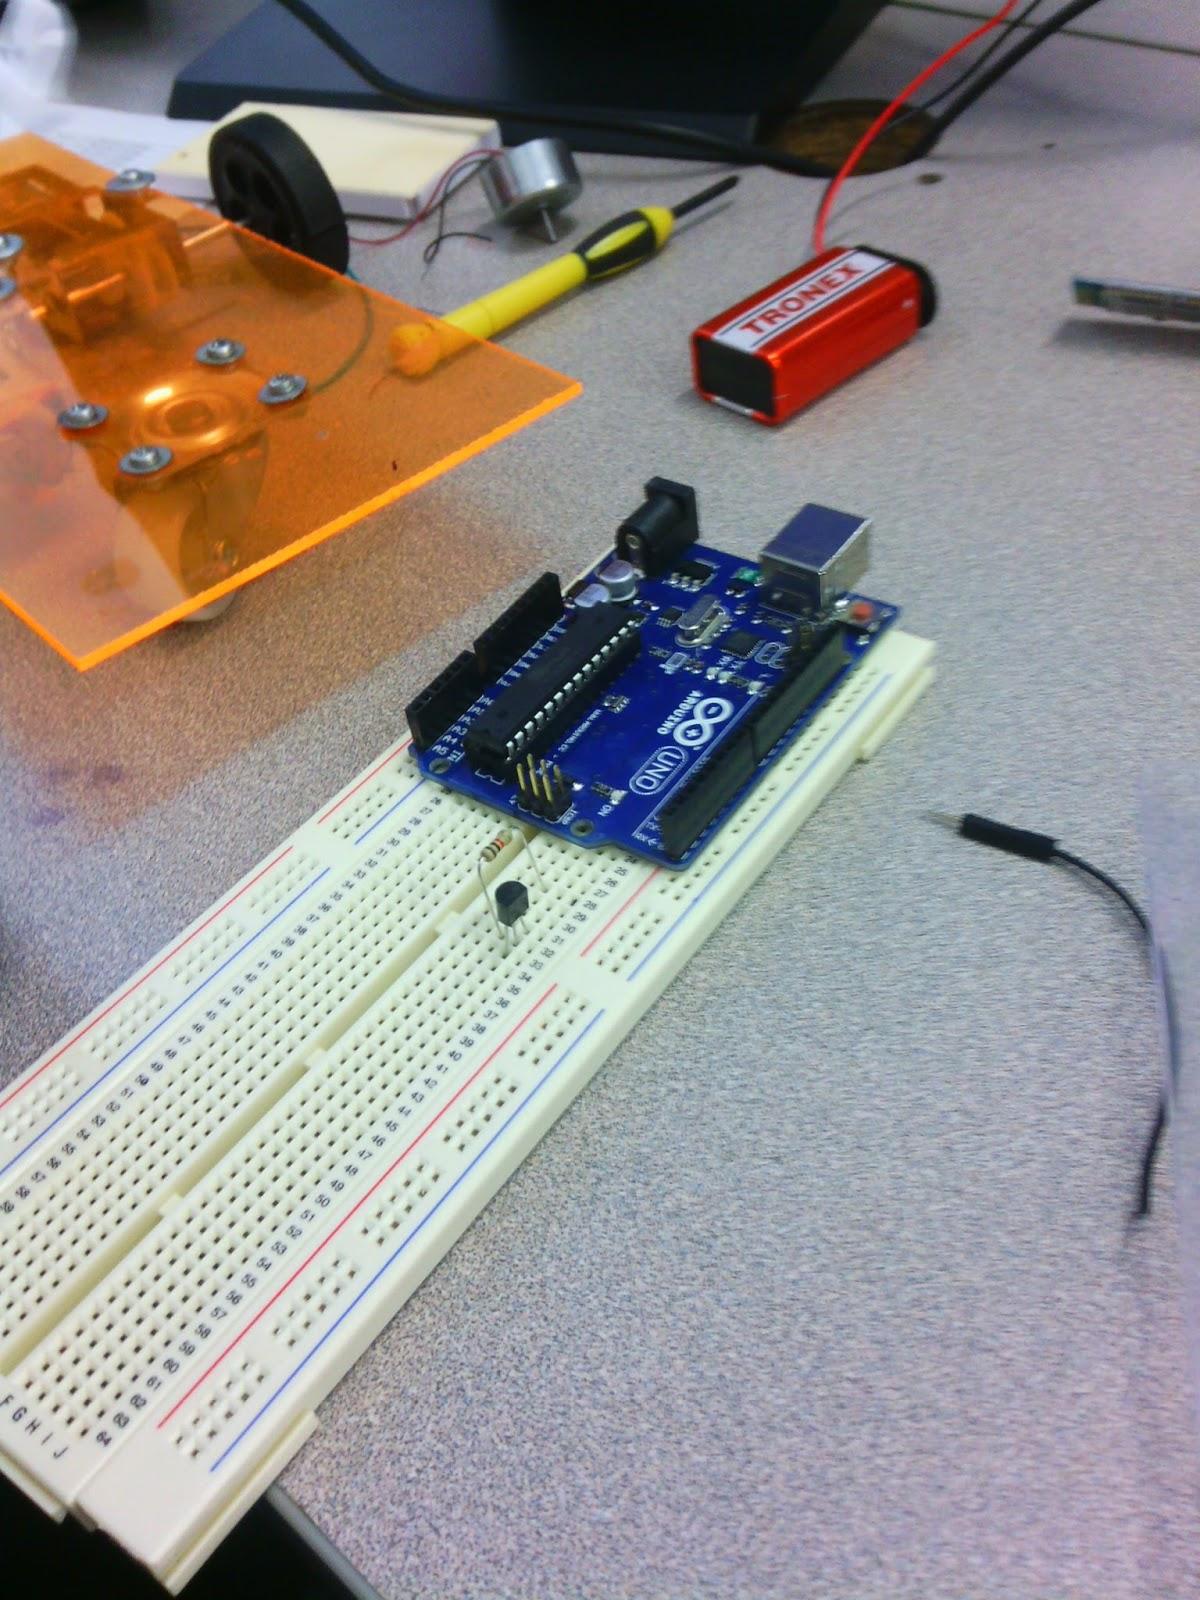 Circuito Bluetooth Casero : Robotica: carro a control remoto controlado por bluetooth